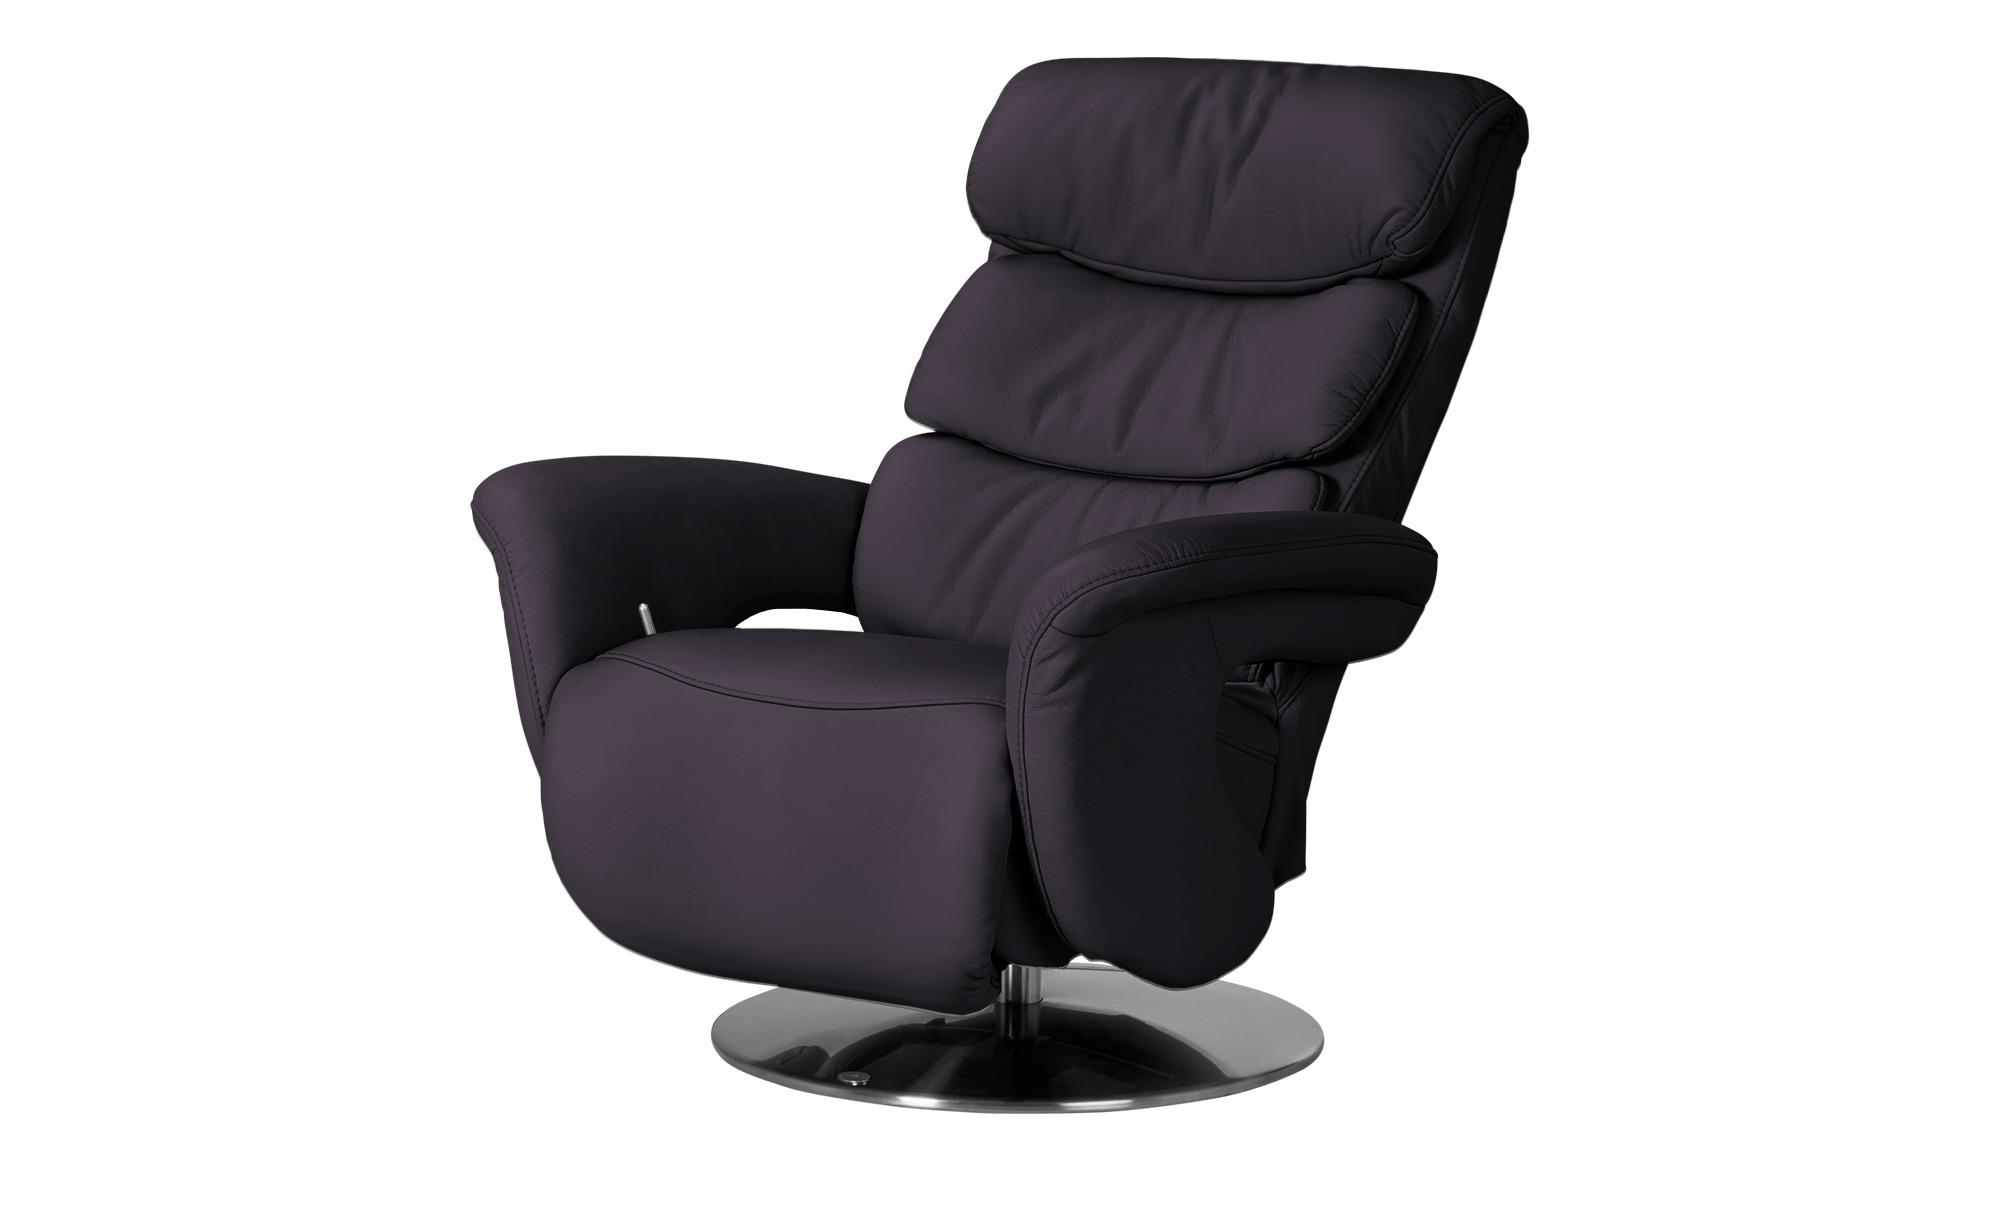 Leder-Relaxsessel lila - Leder Viktoria ¦ lila/violett ¦ Maße (cm): B: 83 H: 113 T: 92 Polstermöbel > Sessel > Fernsehsessel - Höffner